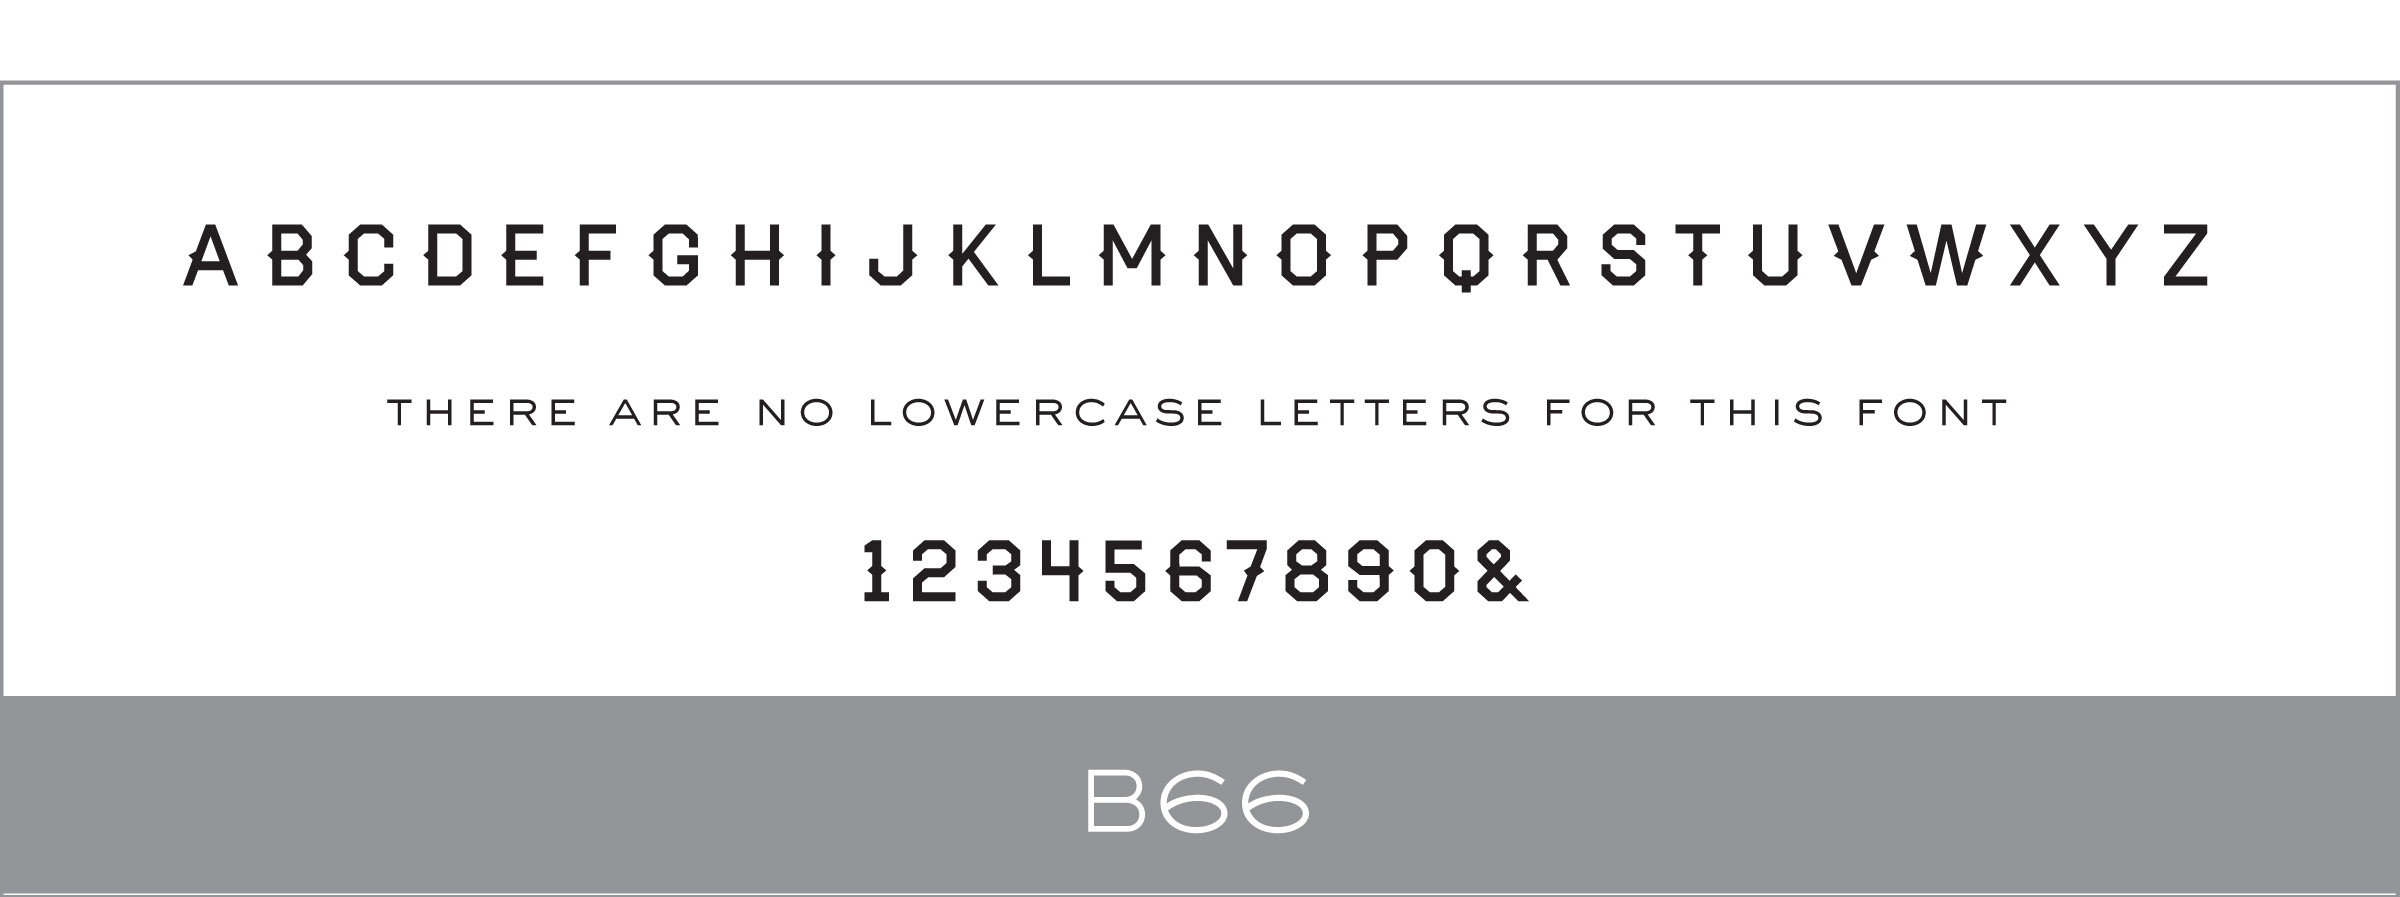 B66_Haute_Papier_Font.jpg